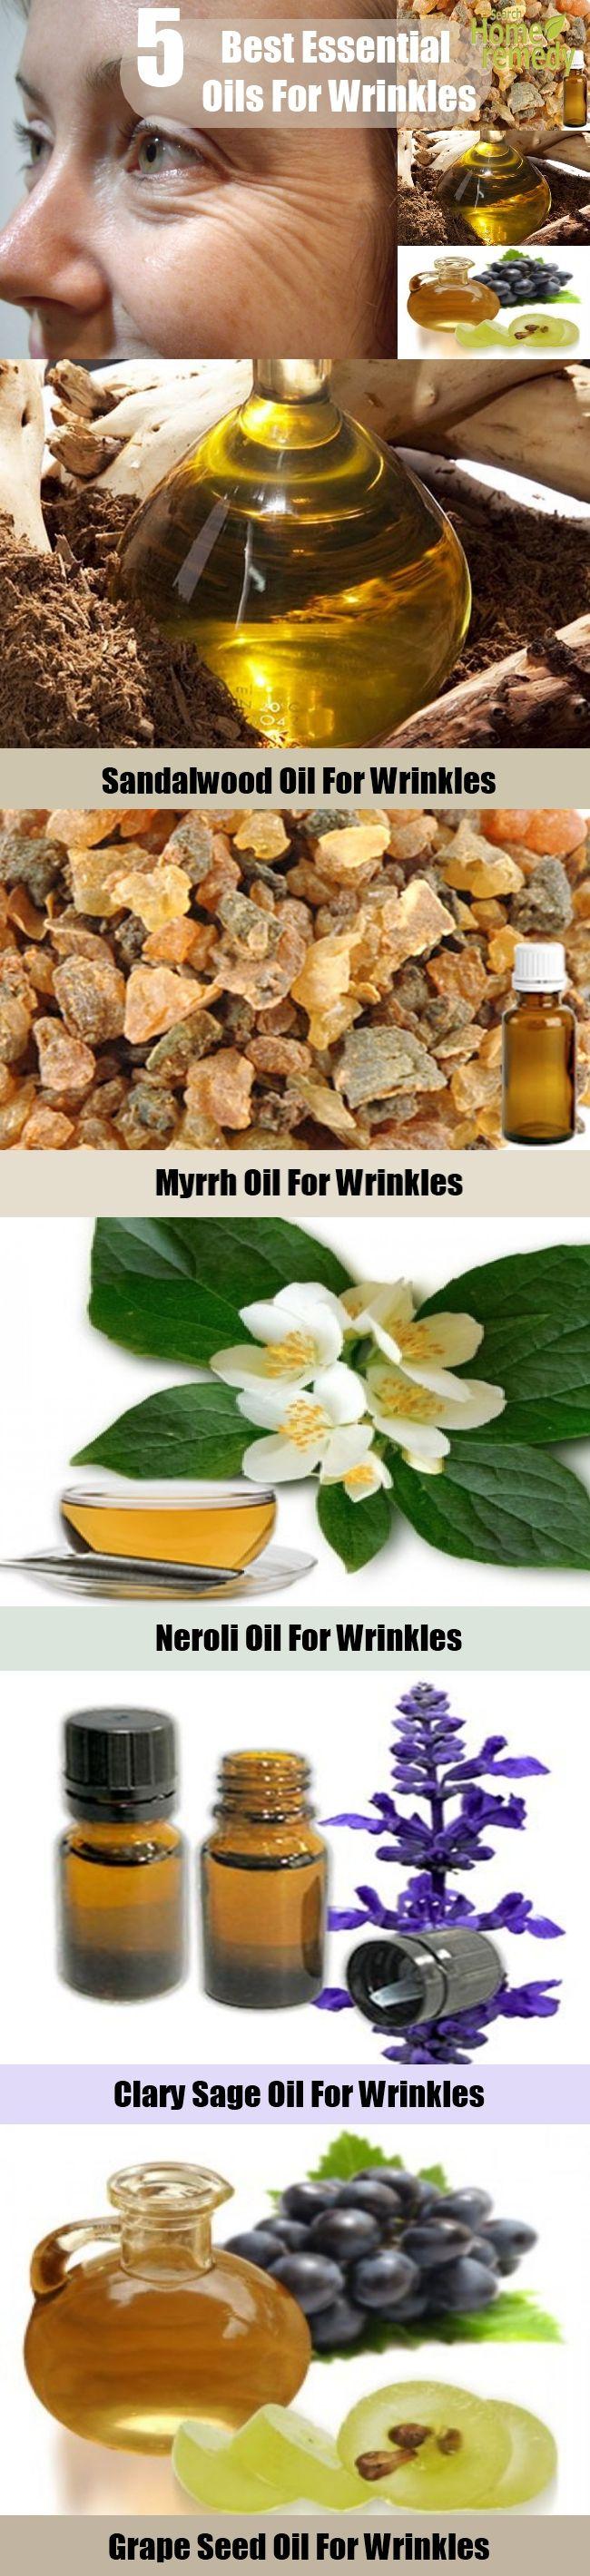 5 Best Essential Oils For Wrinkles